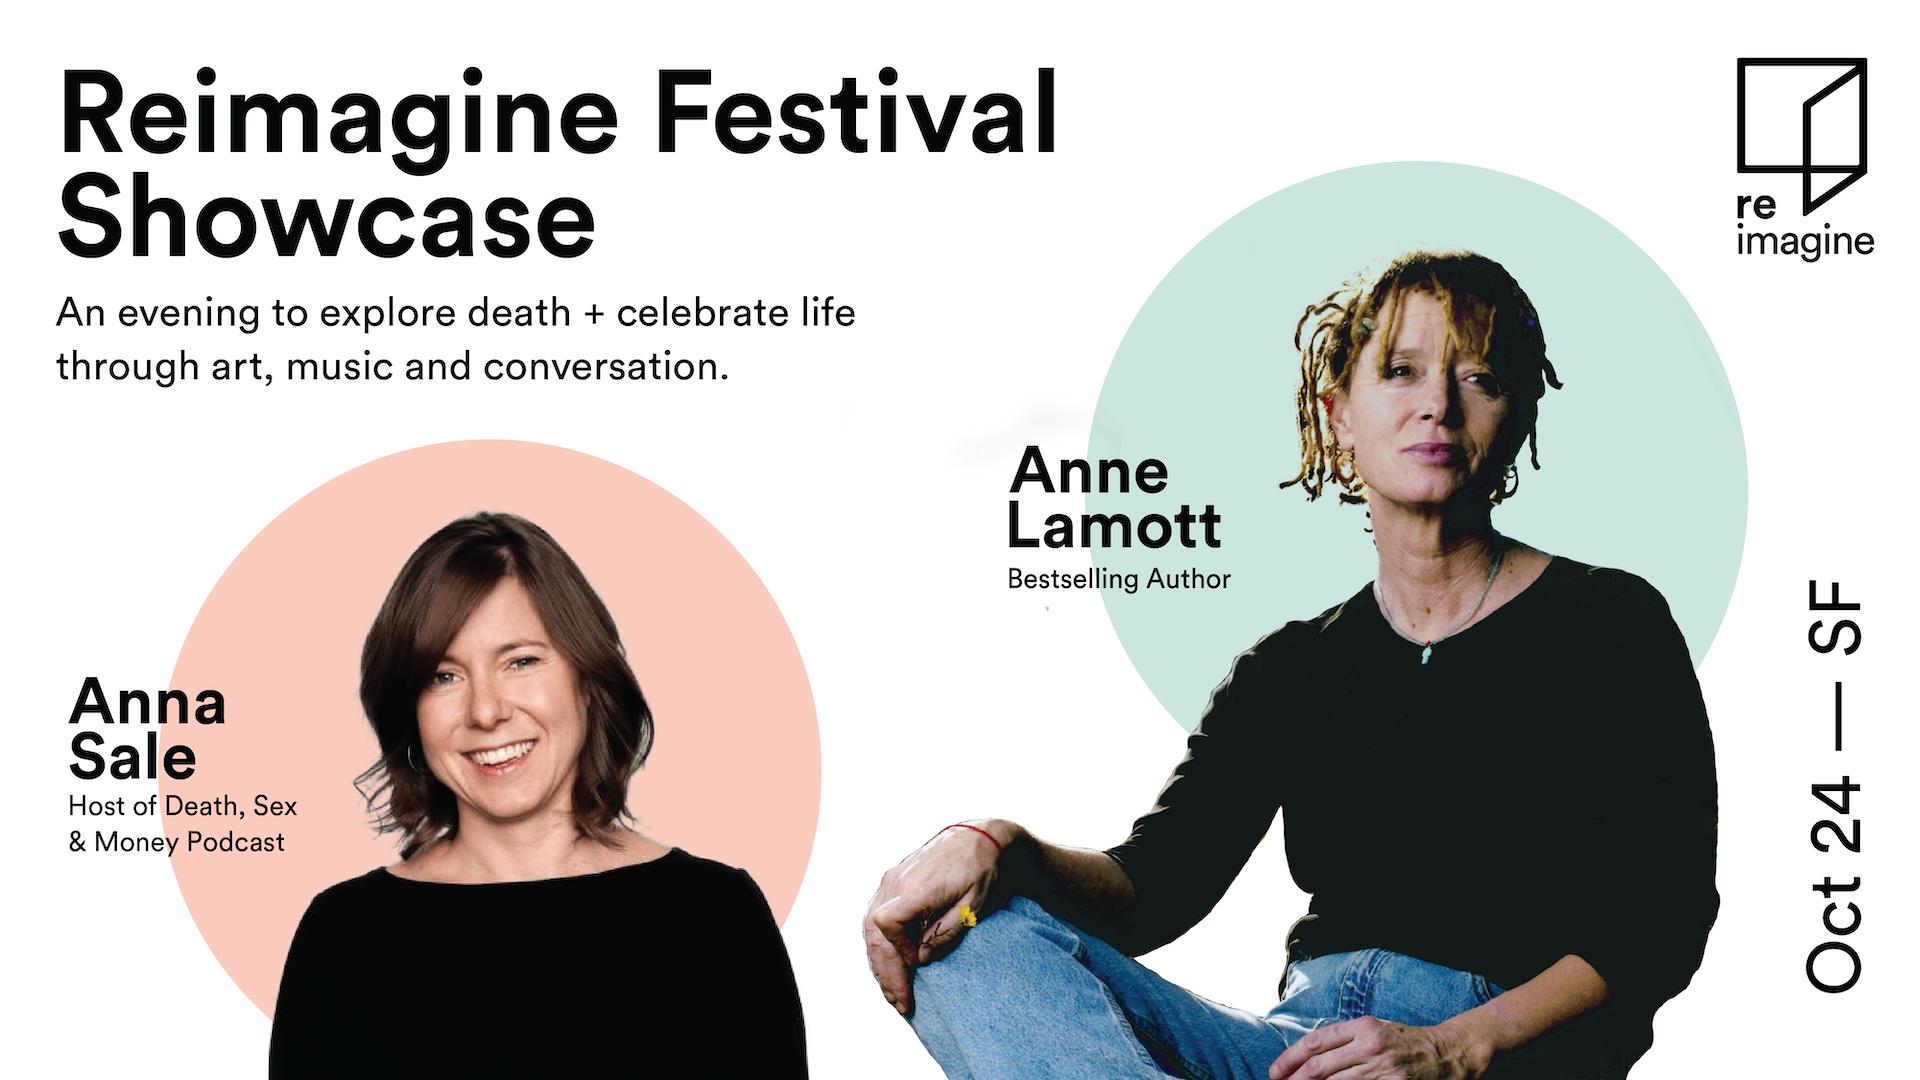 Reimagine Festival collaborators, Anna Sale and Anne Lamott